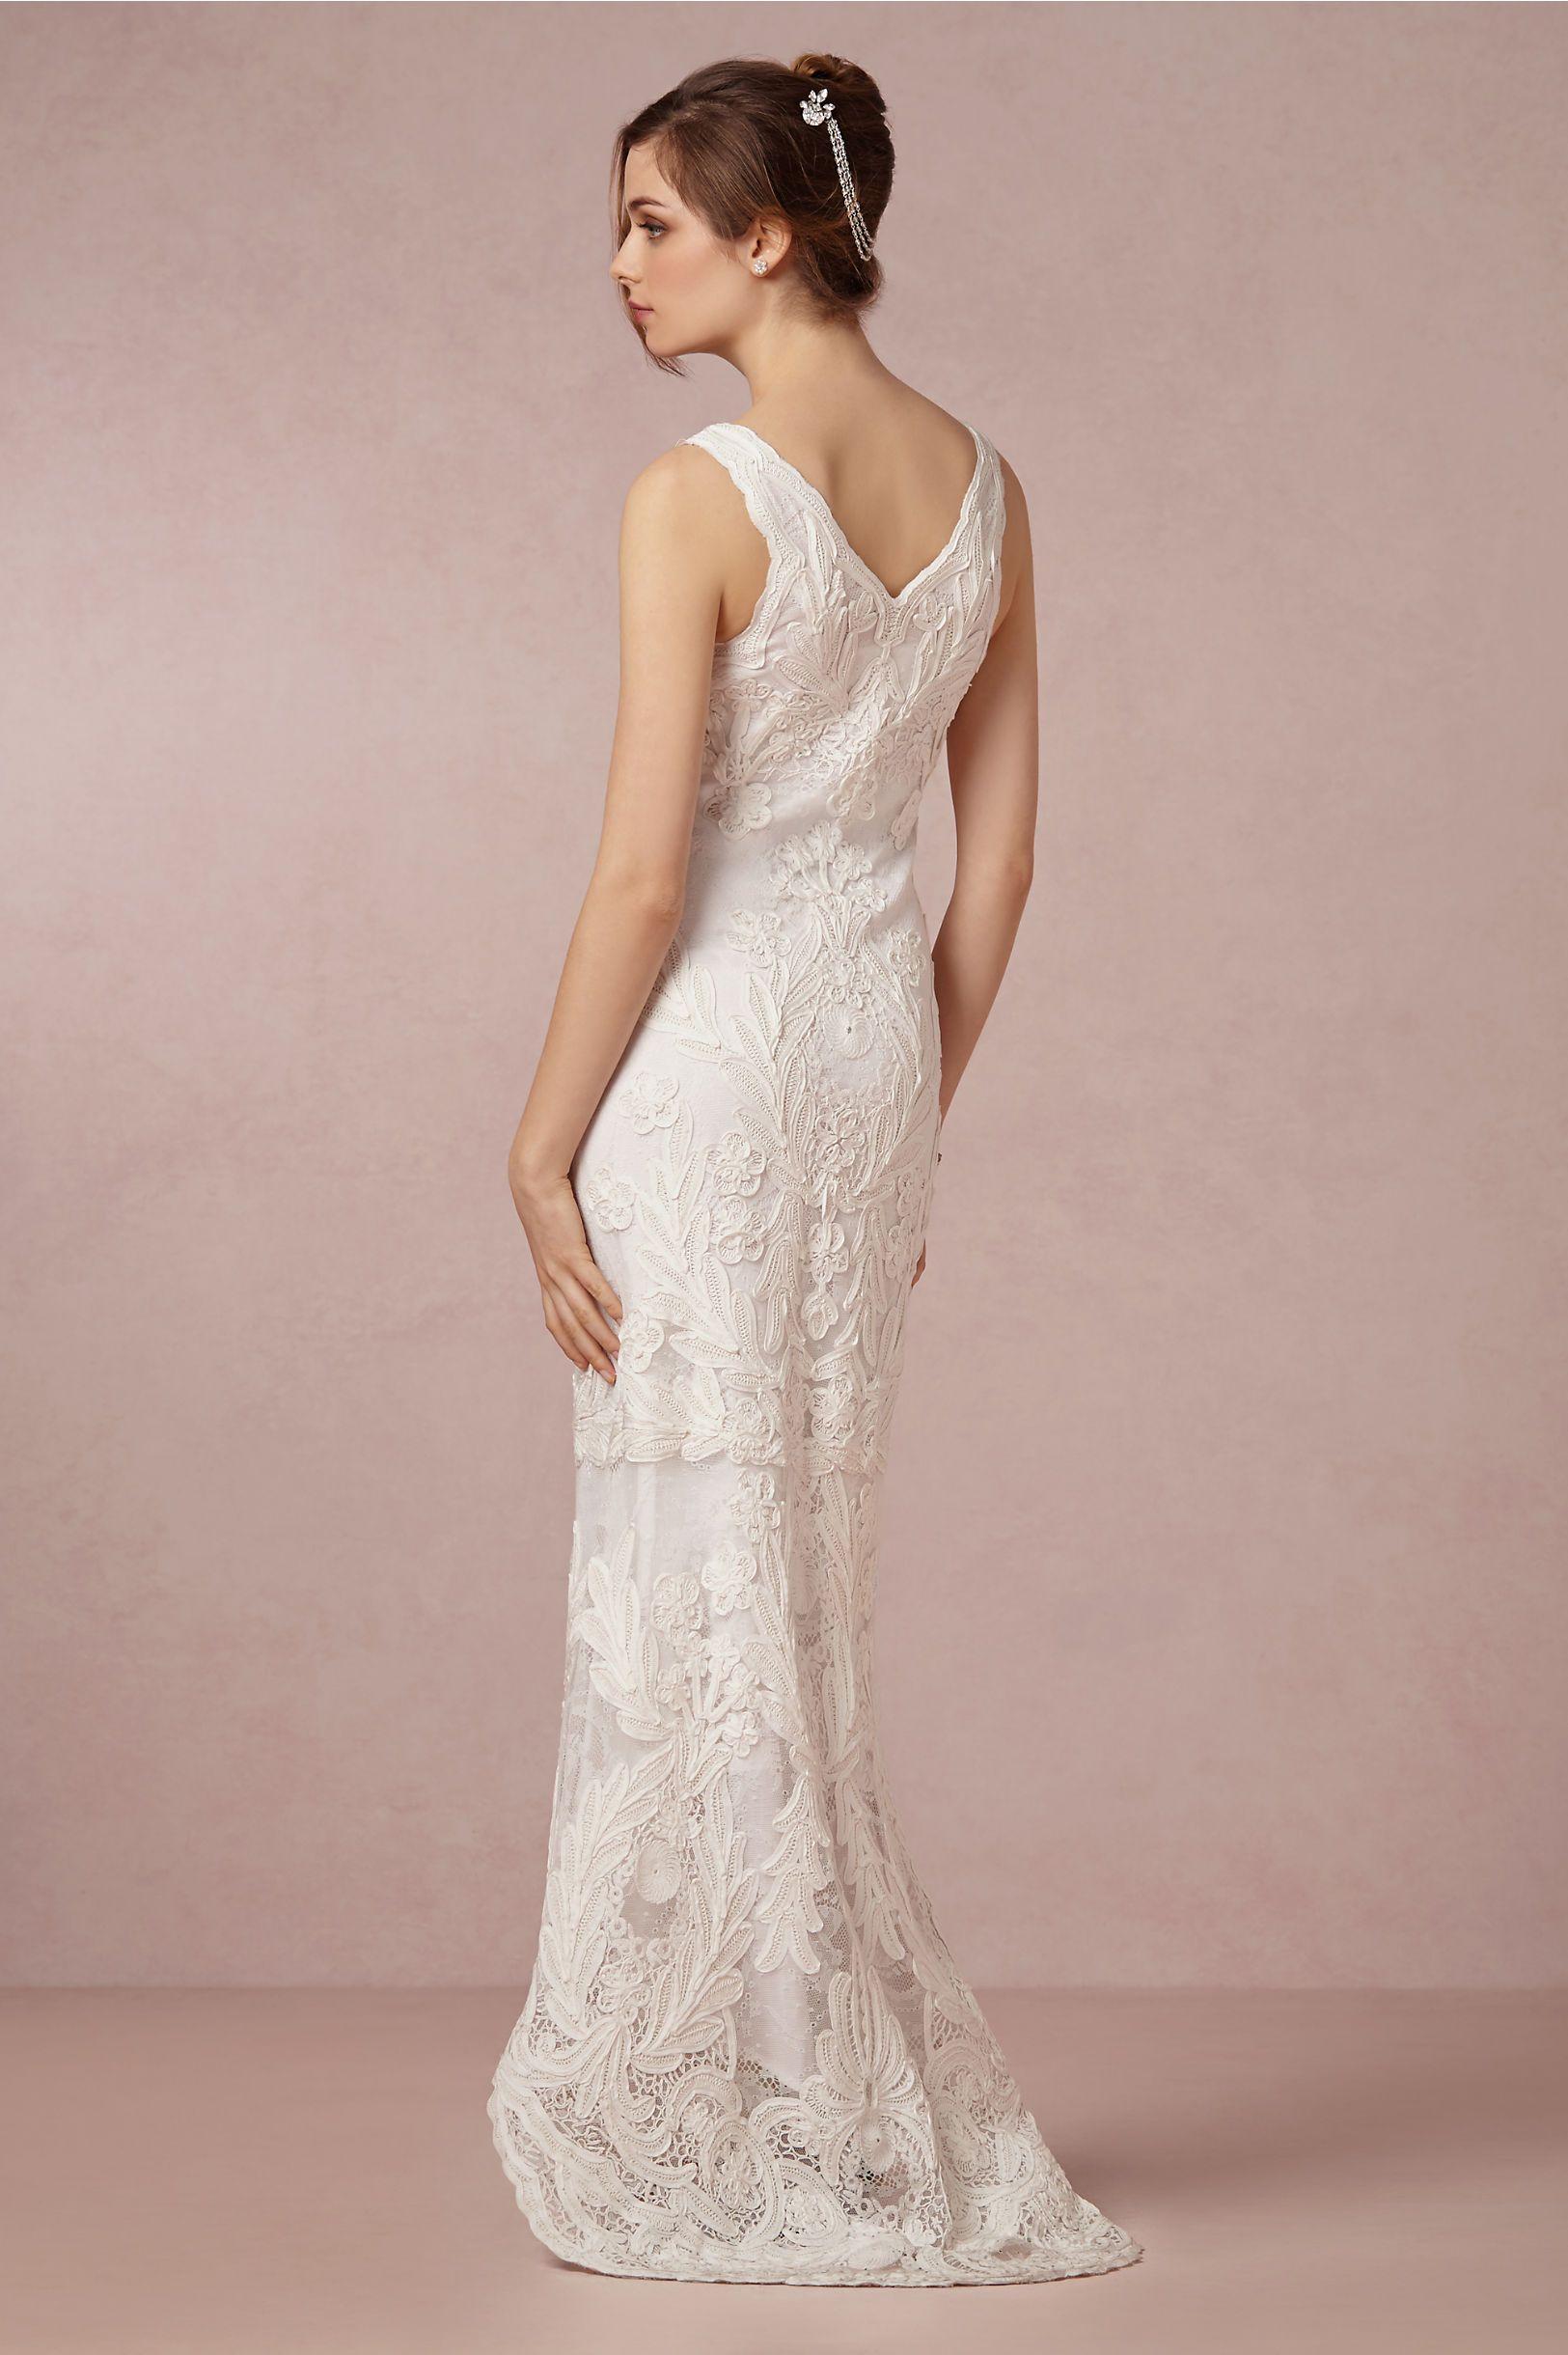 Aberdeen Gown In Bride Wedding Dresses At Bhldn Wedding Dress Shopping Used Wedding Dresses Brides Wedding Dress